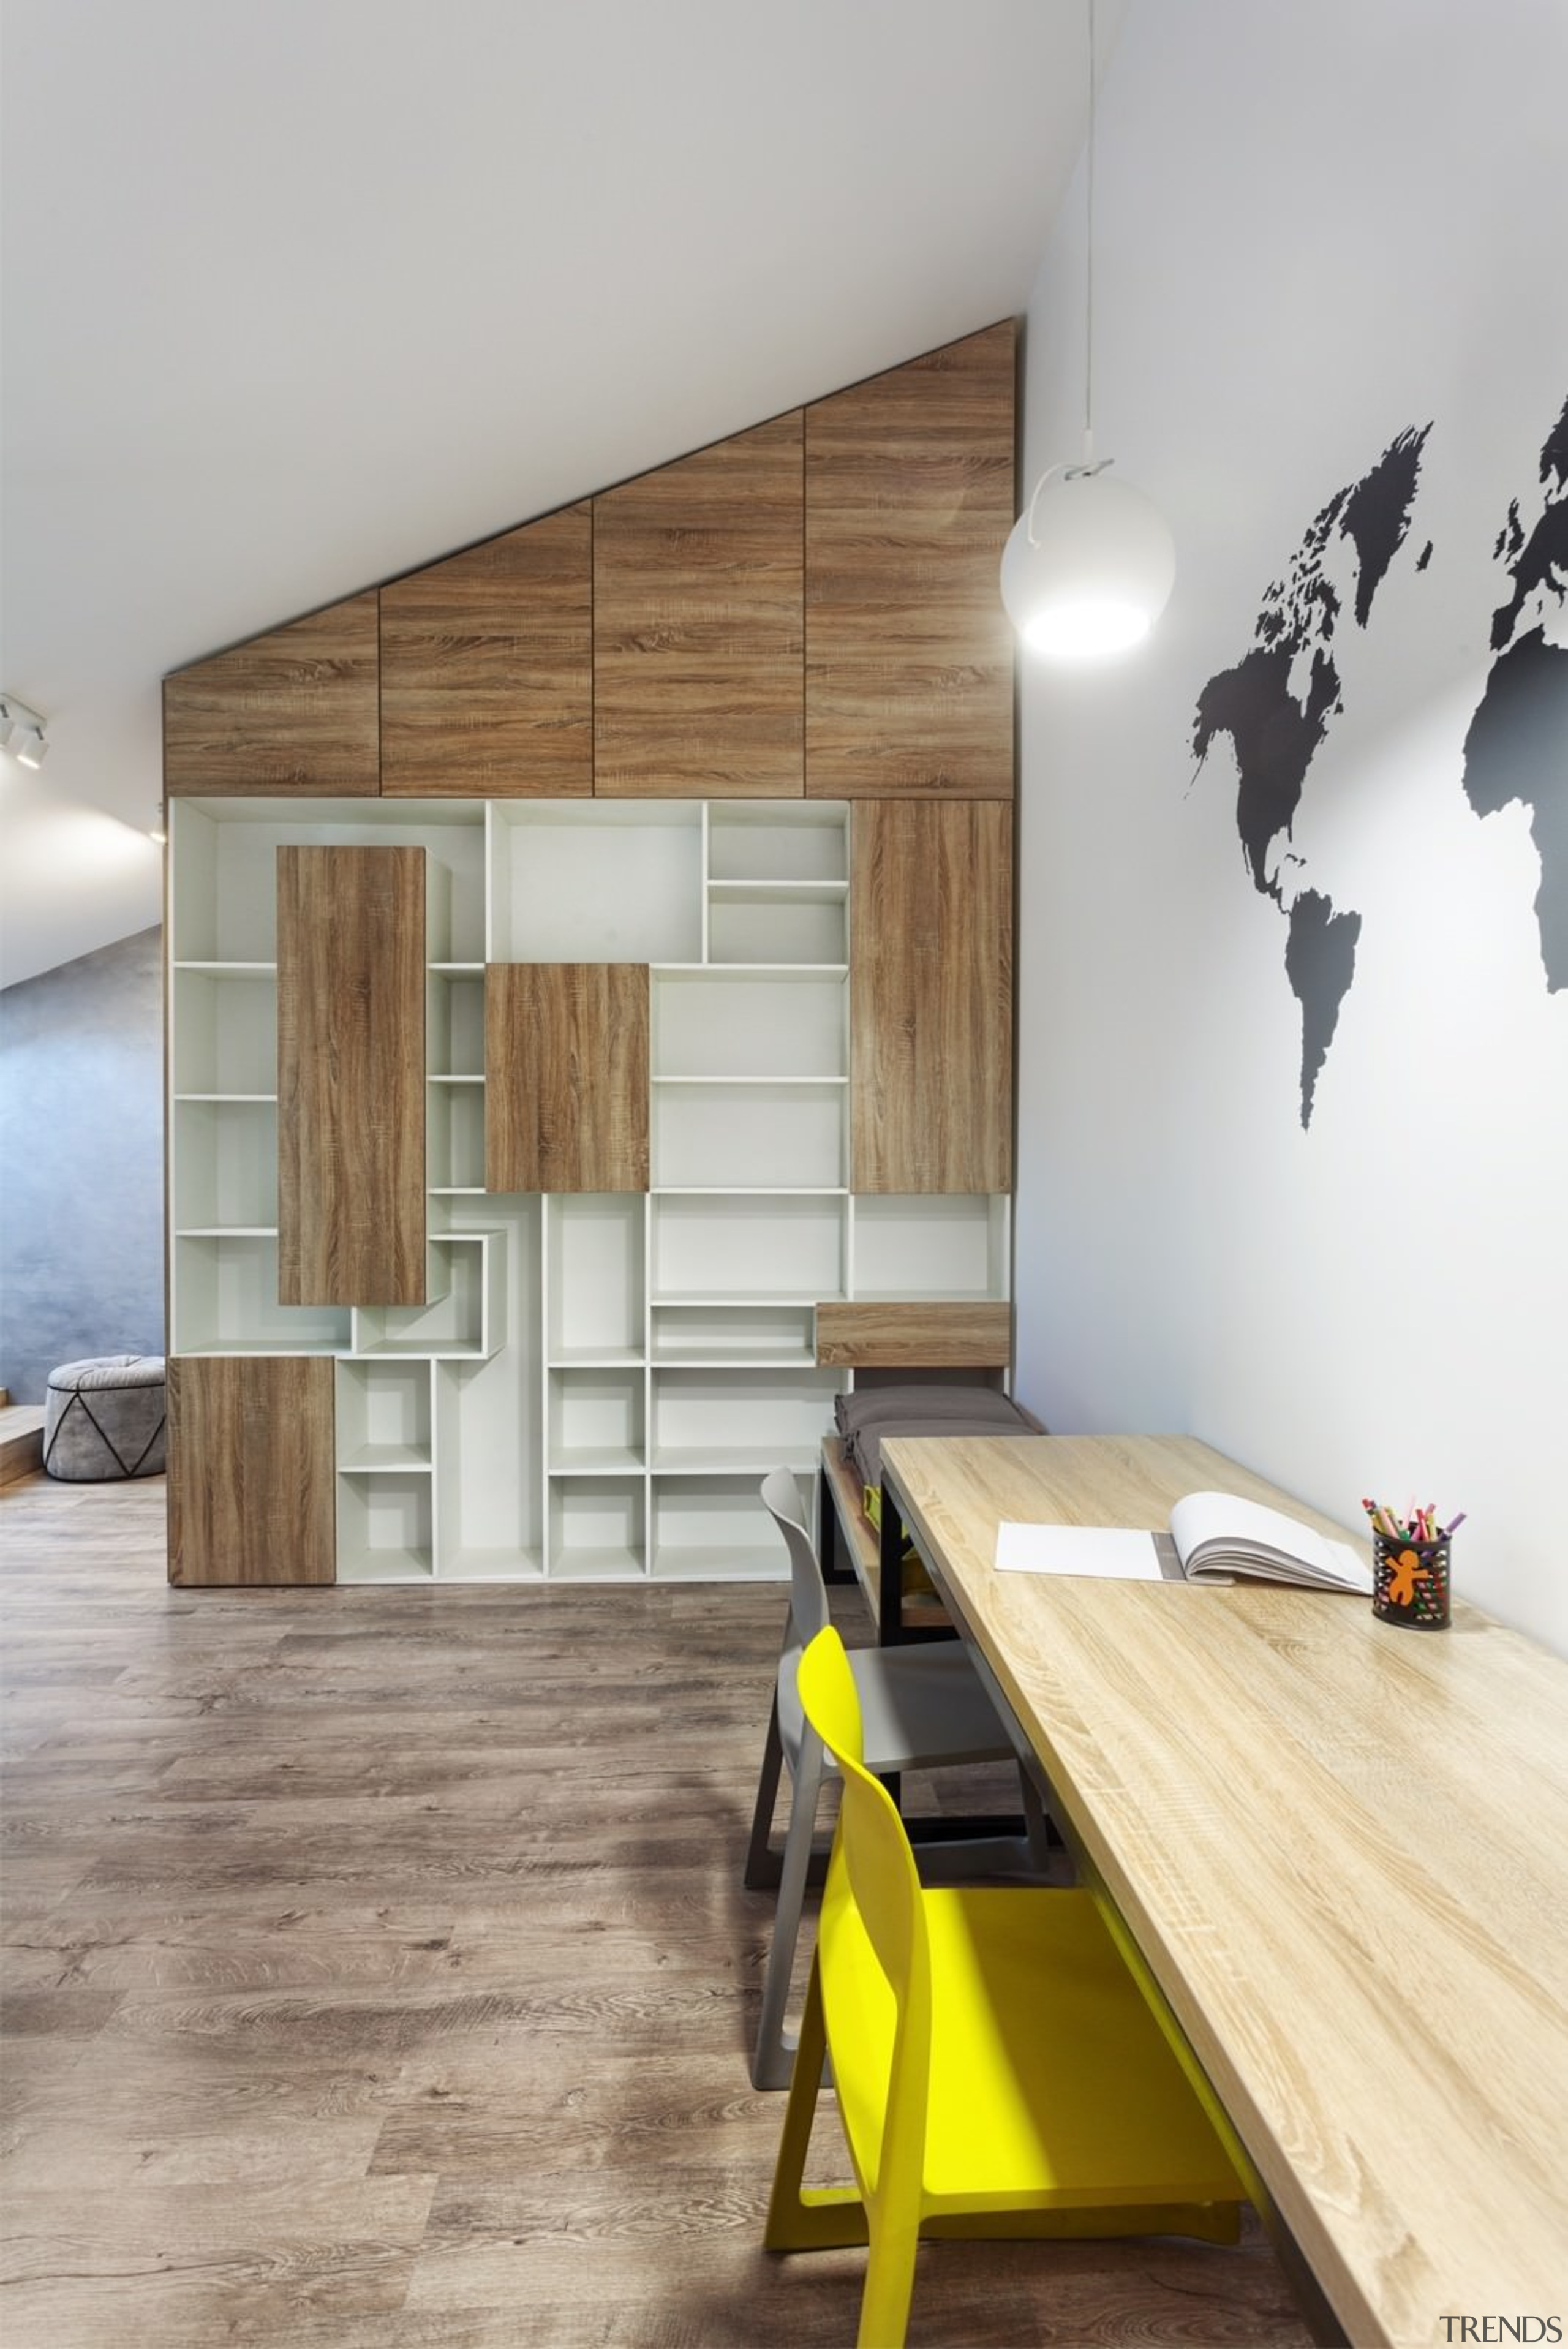 Architect: Martin ArchitectsPhotography by Alexander Kondrianenko architecture, ceiling, floor, flooring, furniture, hardwood, house, interior design, product design, table, wall, wood, wood flooring, gray